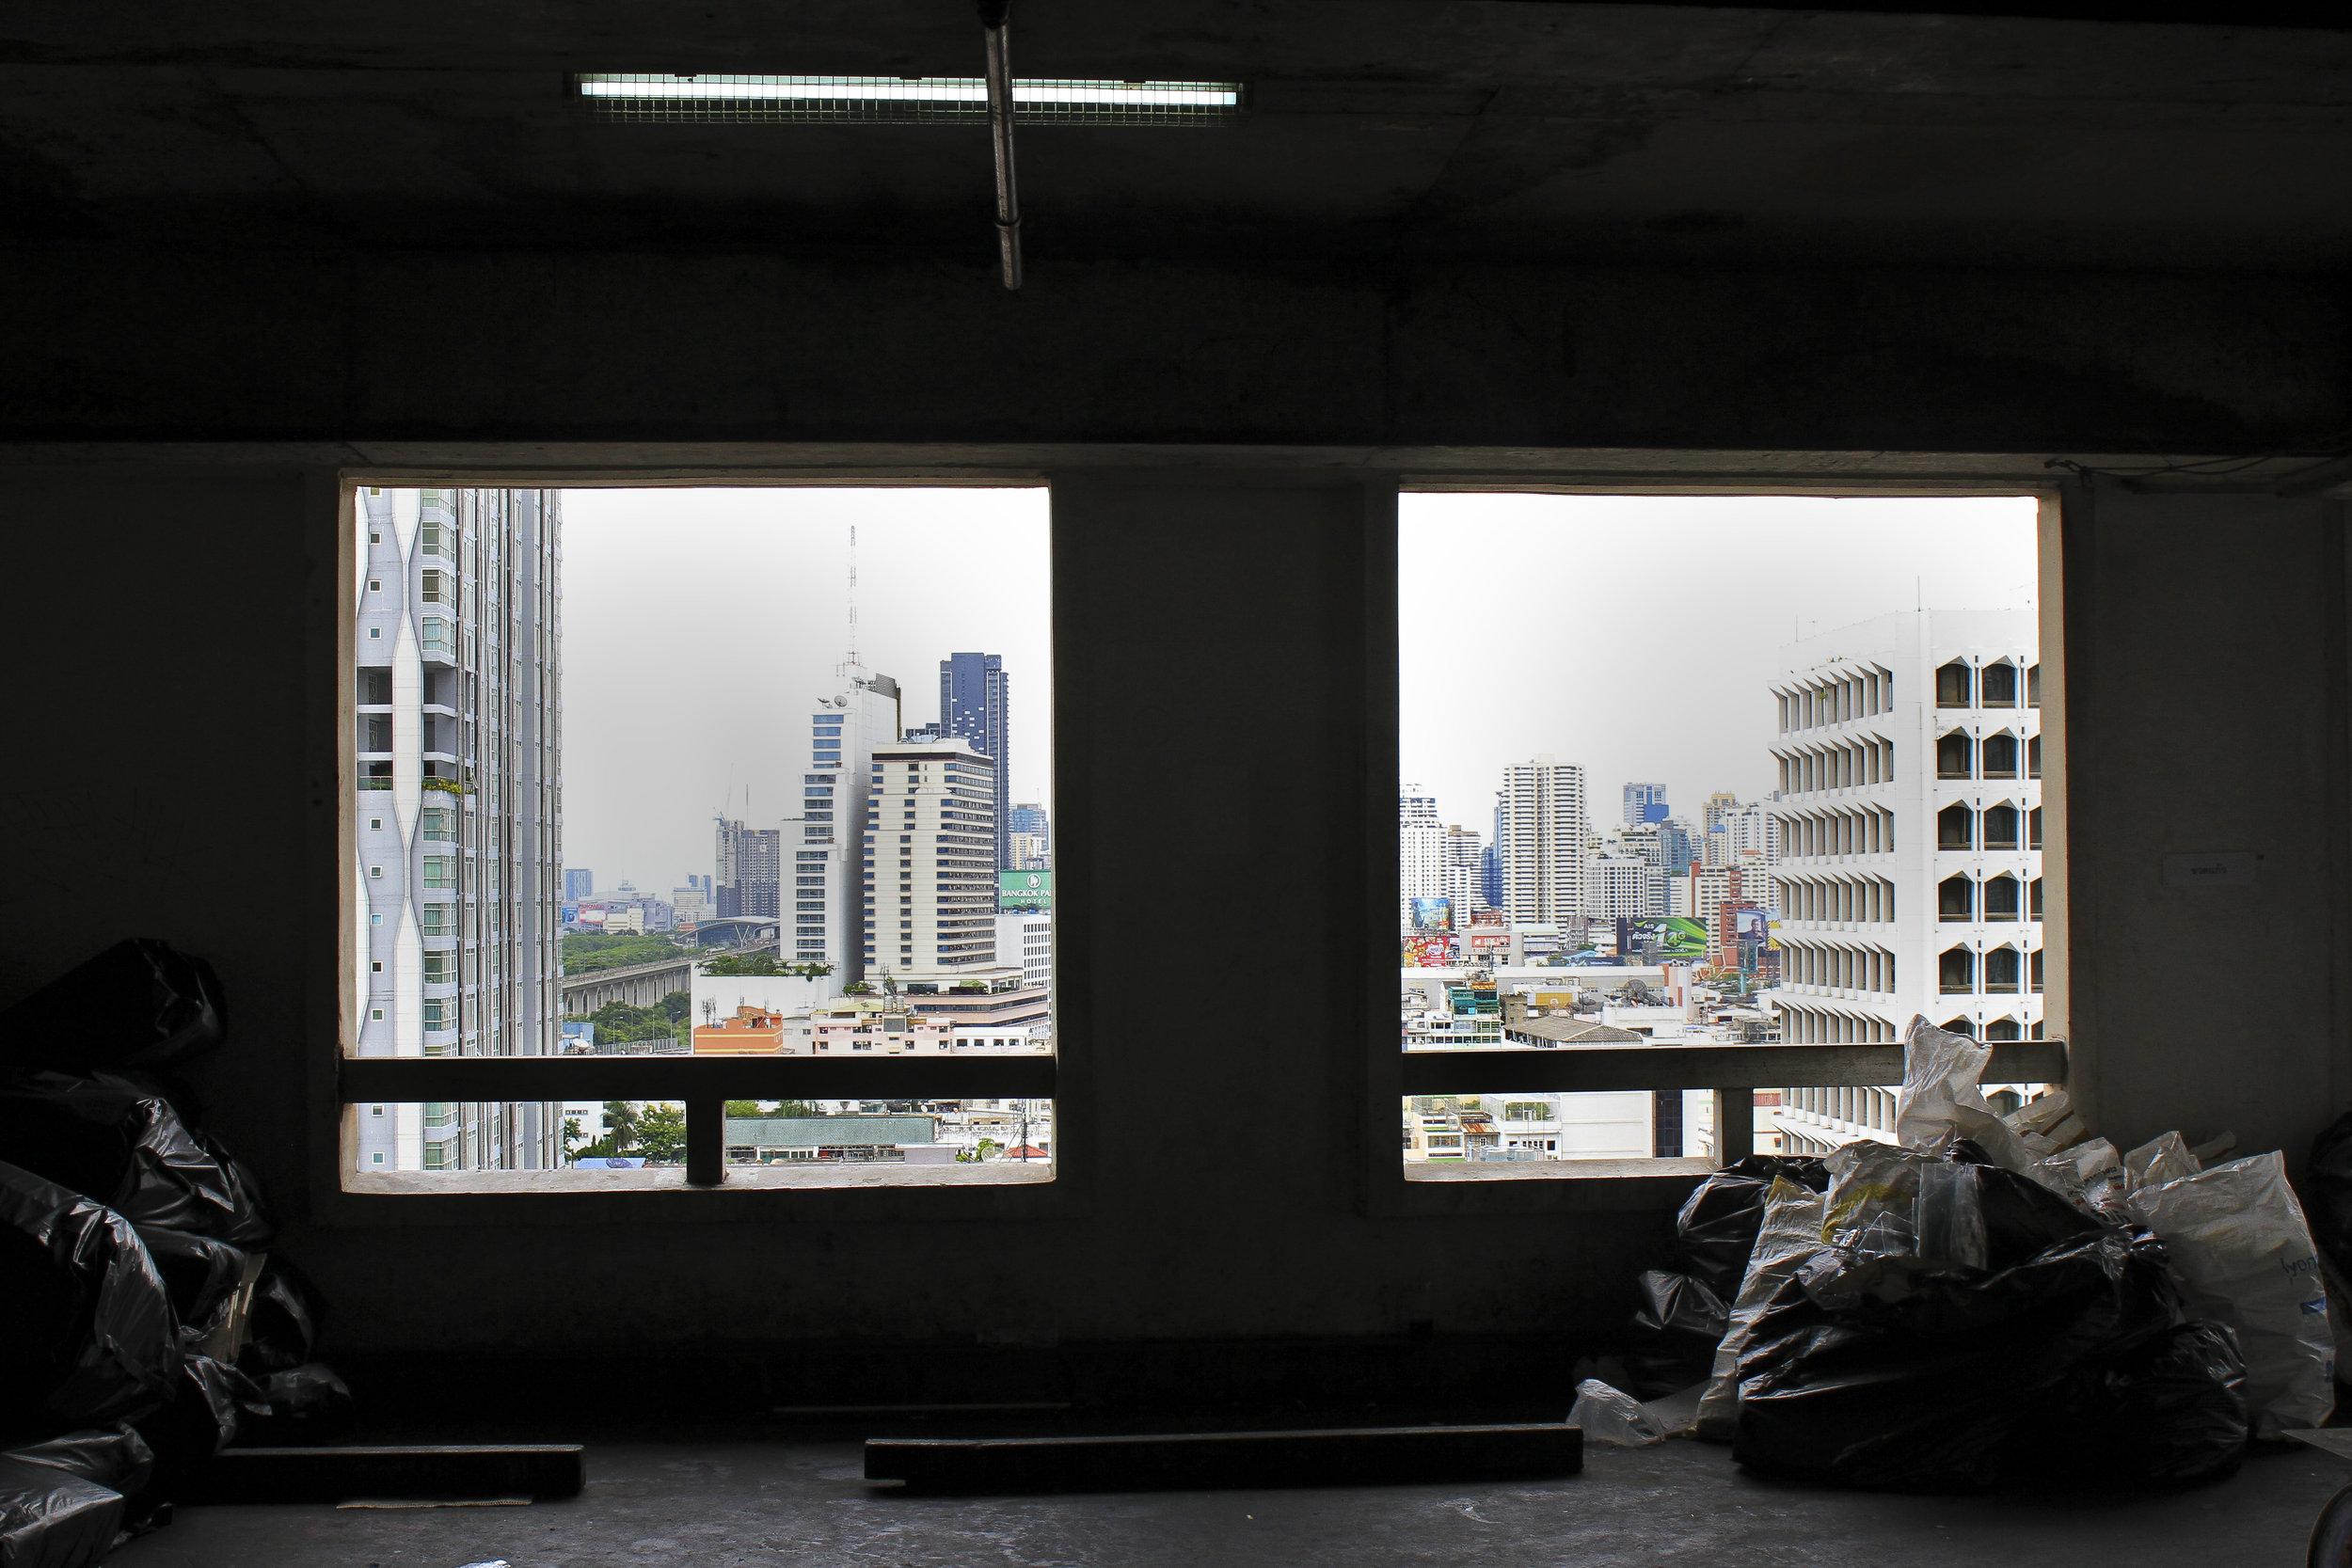 CS_20170718_CanonEOS7D_Thaïlande_Bangkok (16)RR.jpg